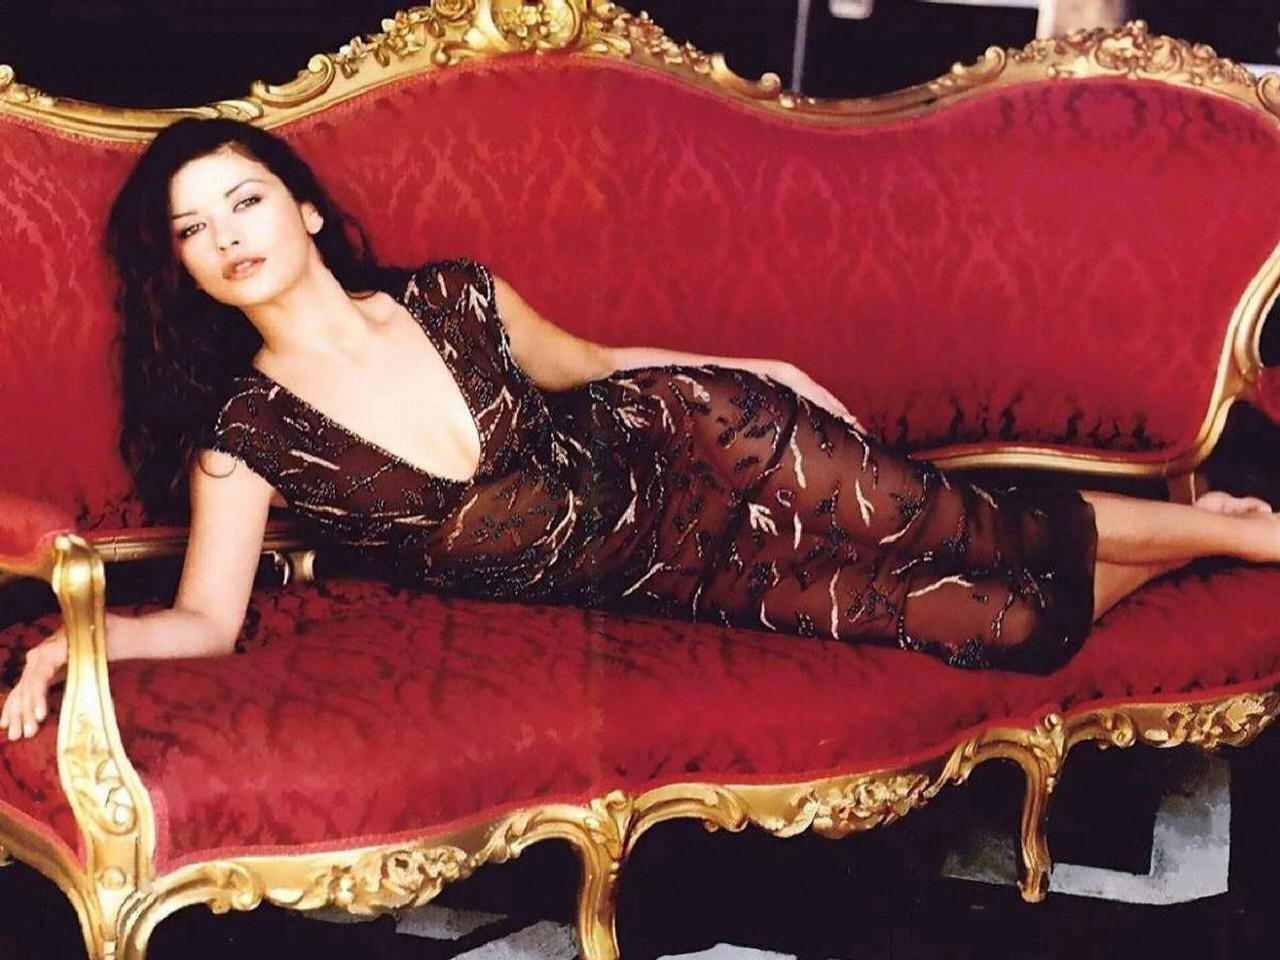 Wallpaper di Catherine Zeta-Jones, splendida regina del cinema USA